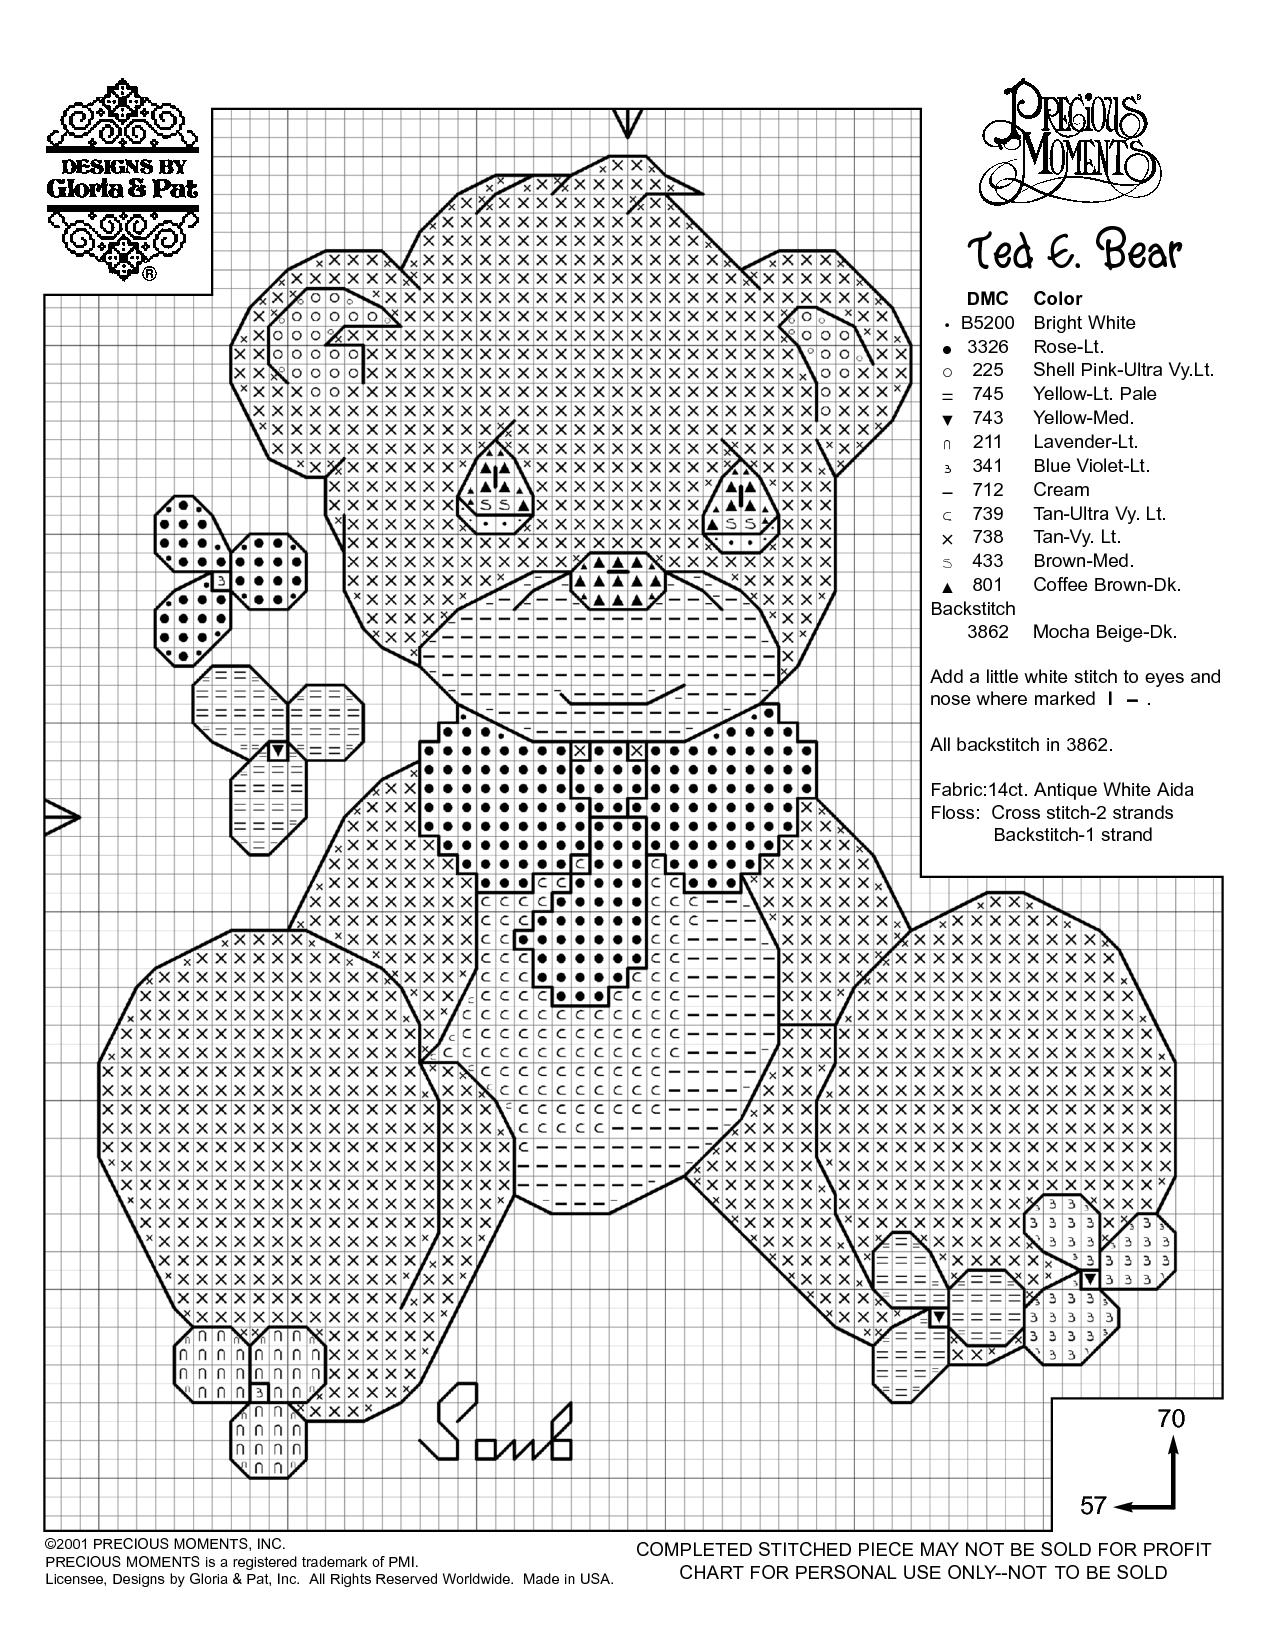 Free Printable Cross Stitch Patterns | Needlework Projects - Cross Stitch Patterns Free Printable